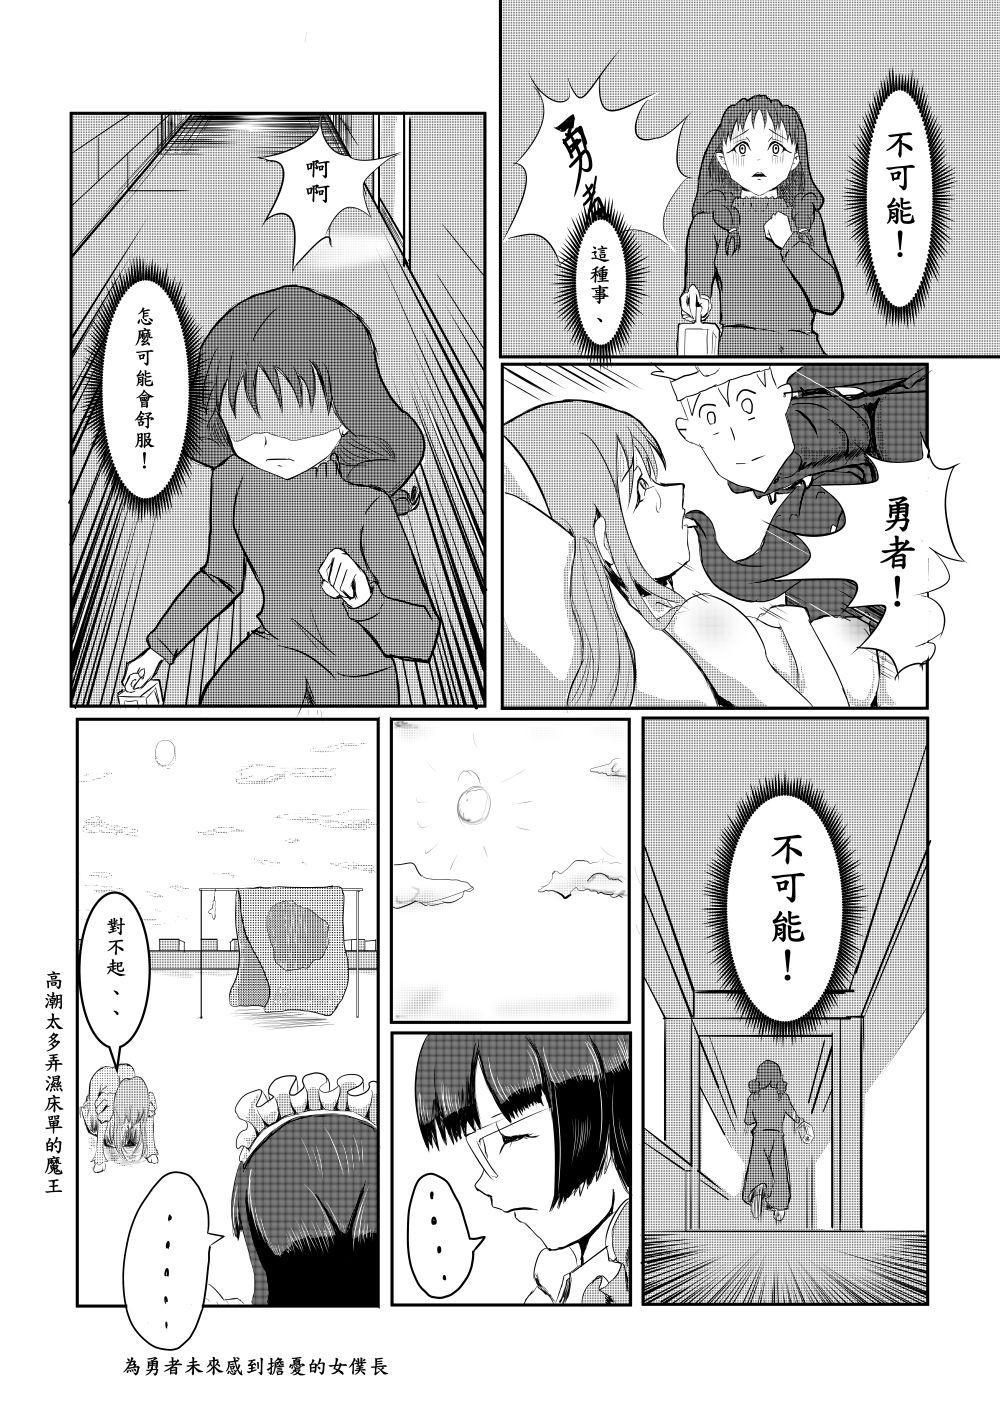 Maou Yuusha - Kachiku Kiki 3 19